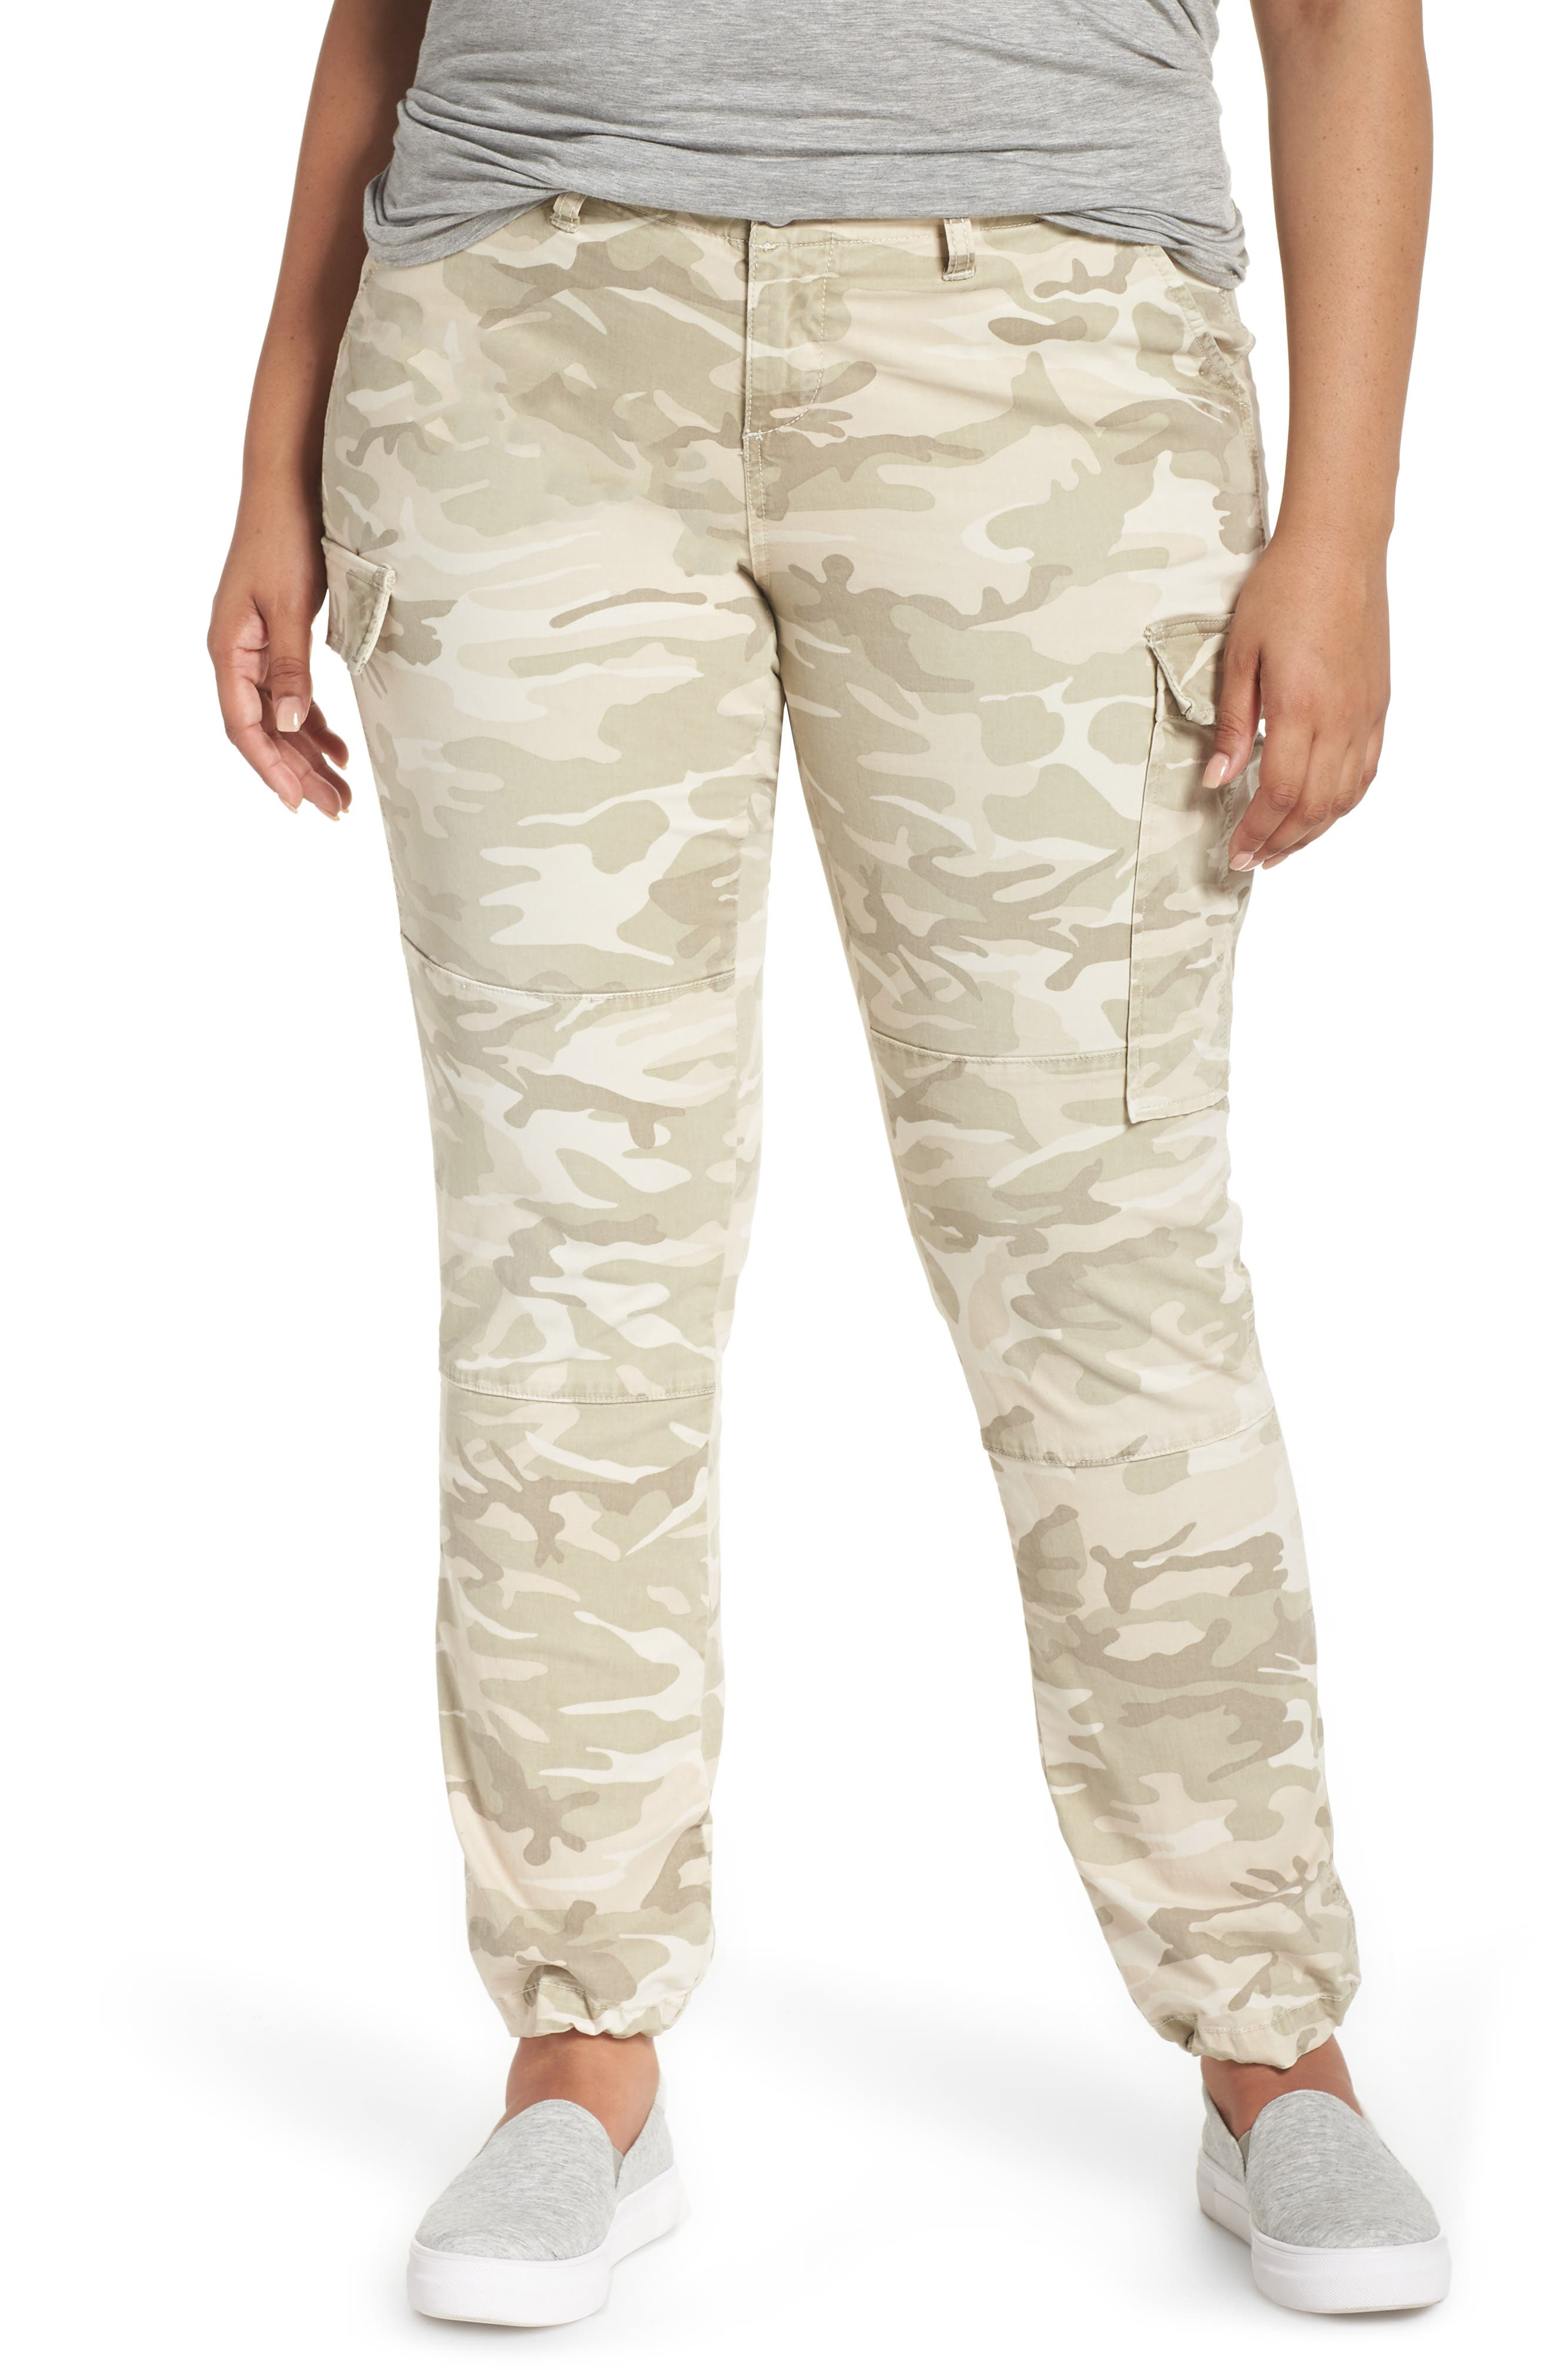 Plus Size Slink Jeans Camo Twill Cargo Pants, Ivory